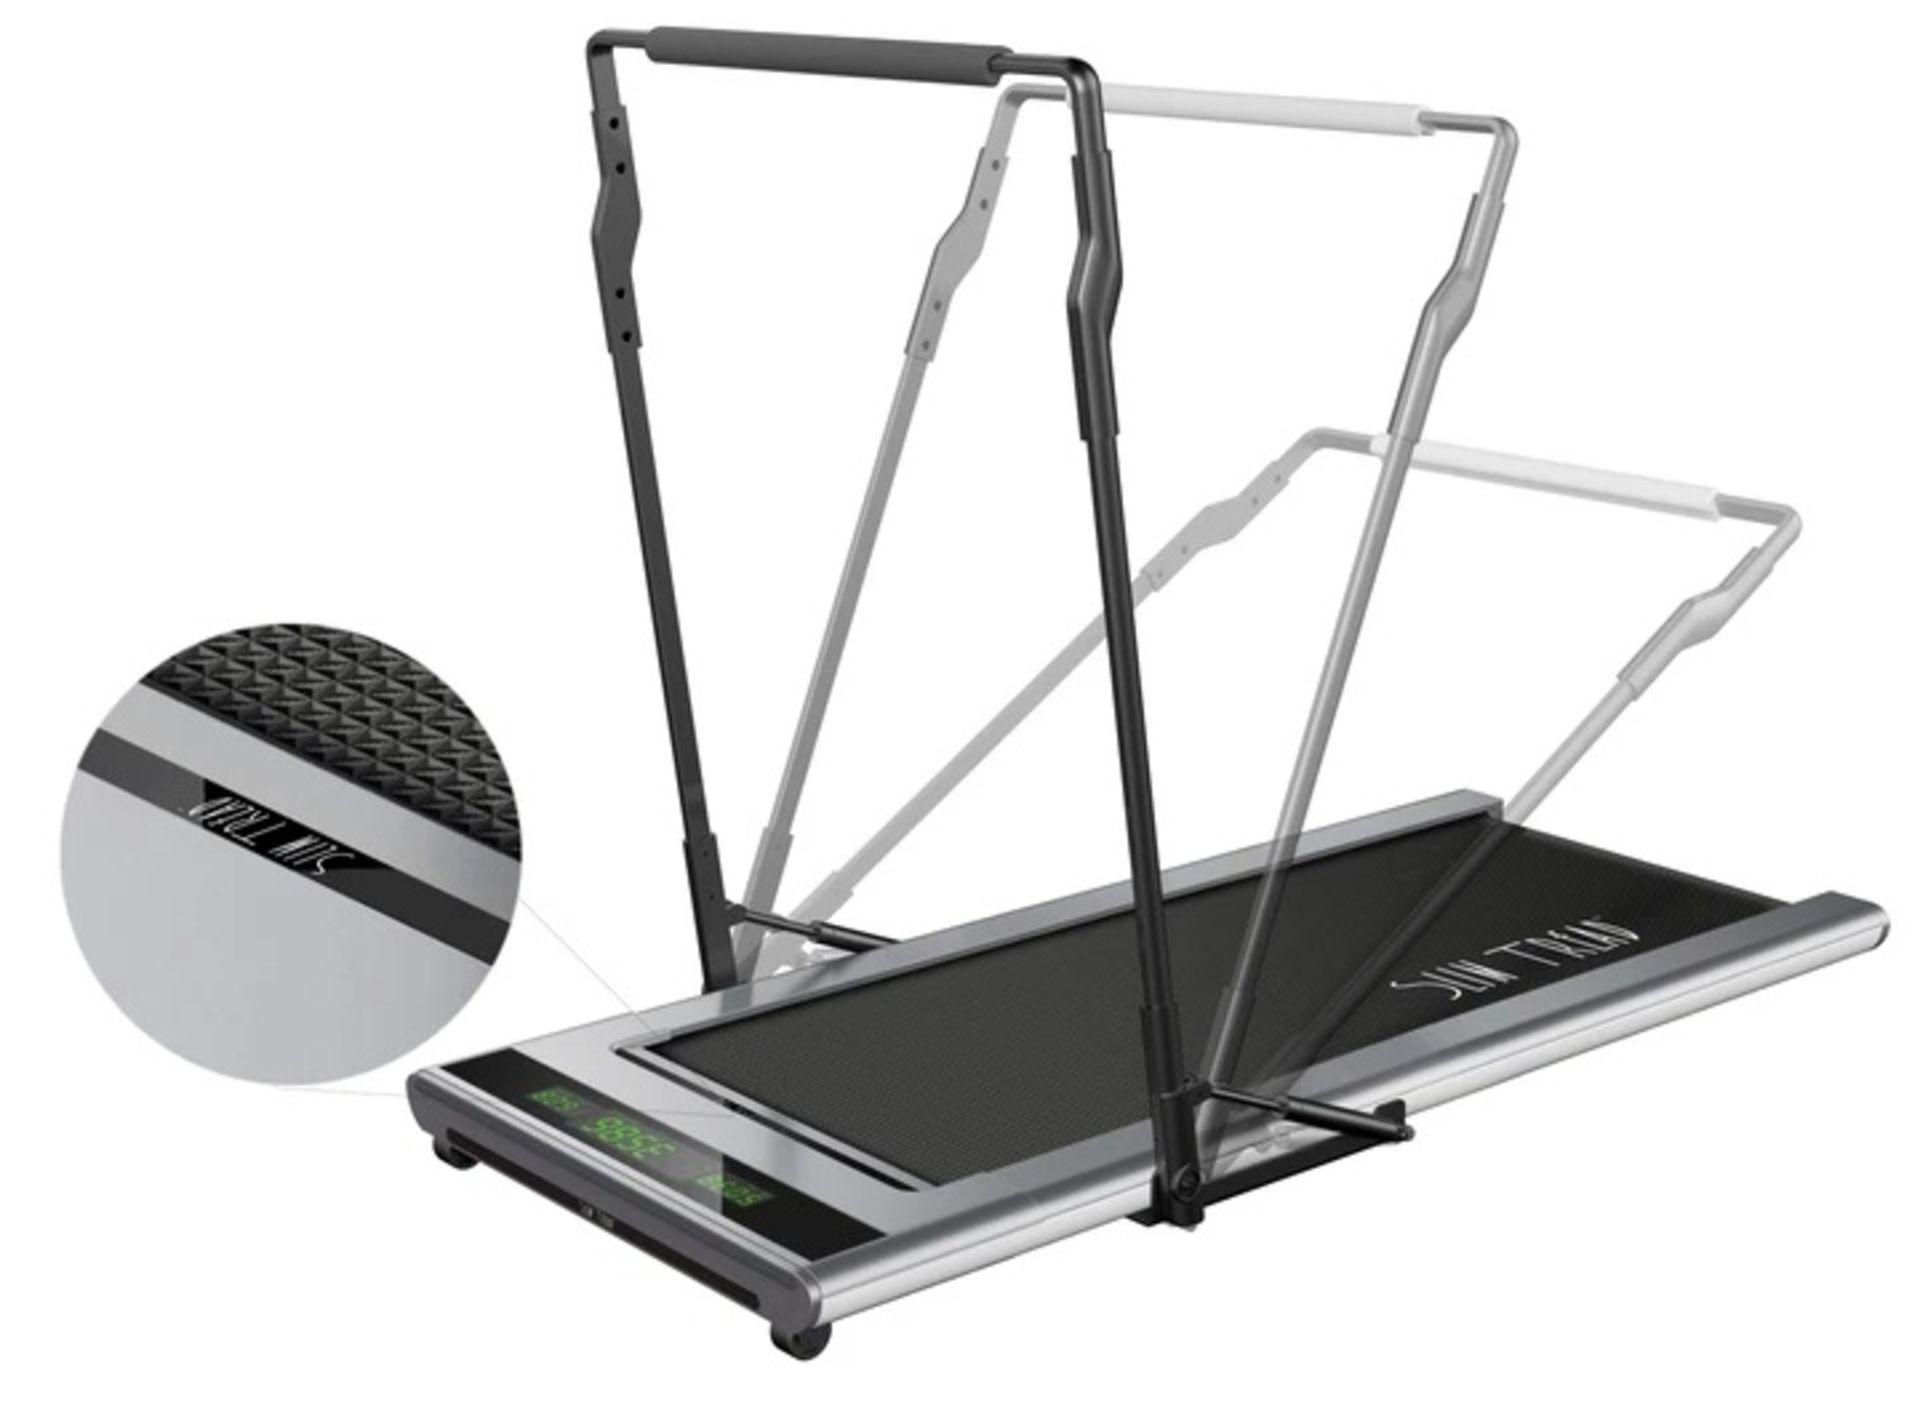 1 x Slim Tread Ultra Thin Smart Treadmill Running / Walking Machine - Lightweight With Folding - Image 18 of 23